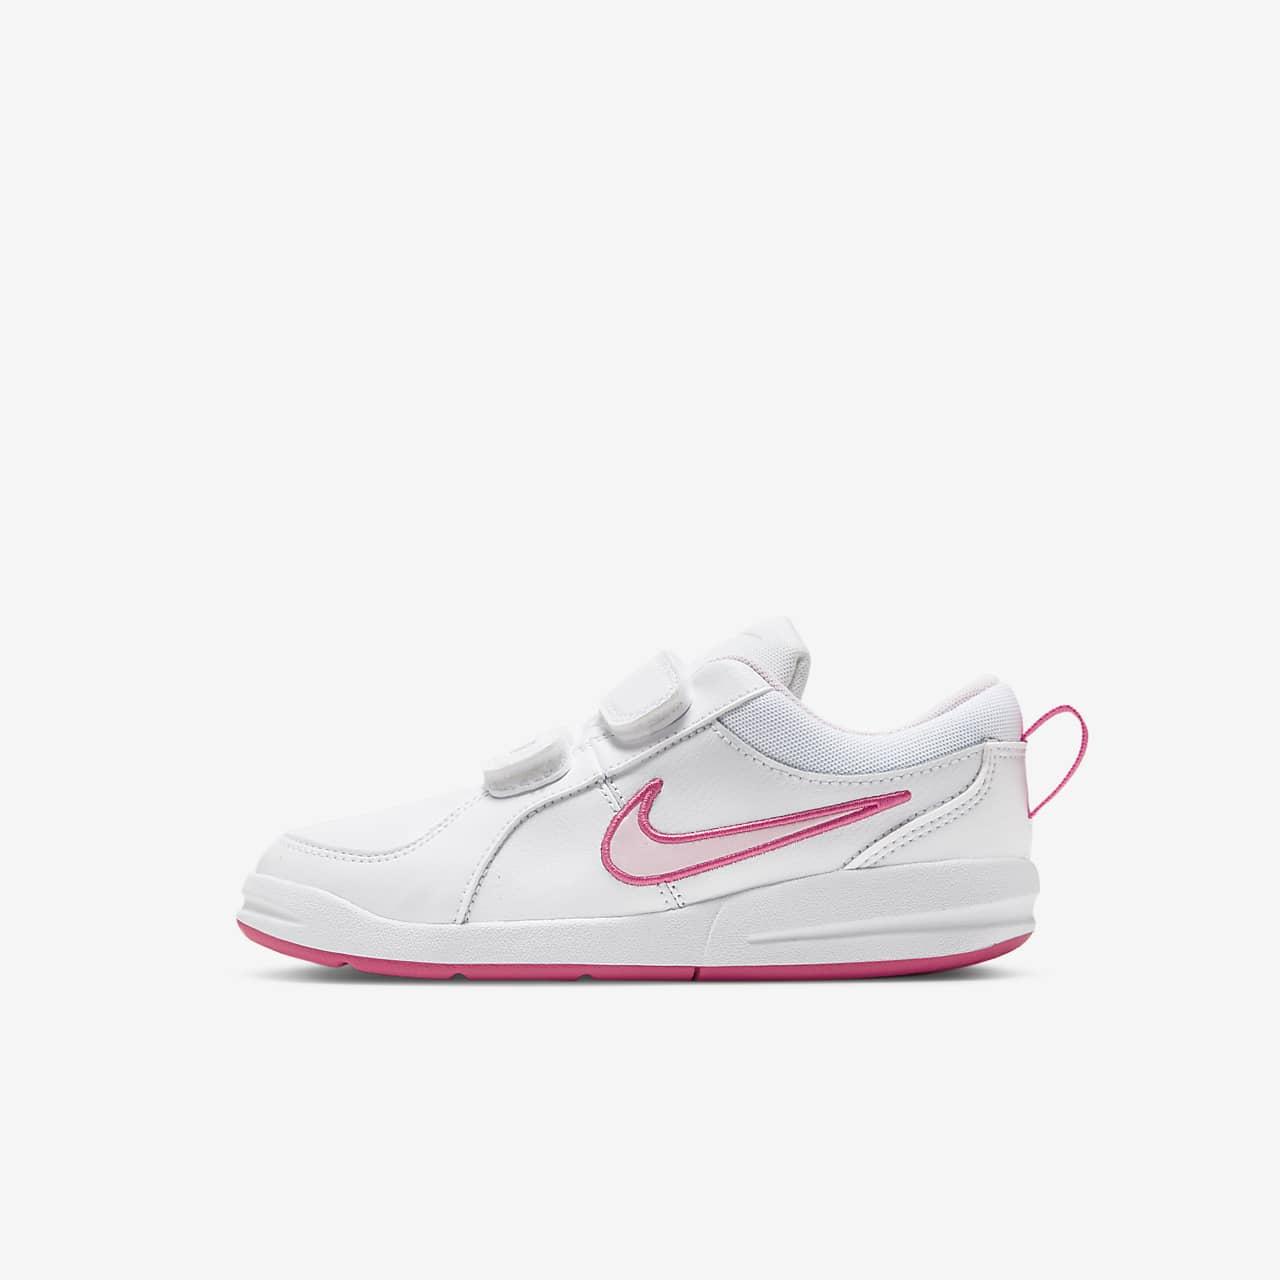 Nike Pico 4 Mädchenschuh